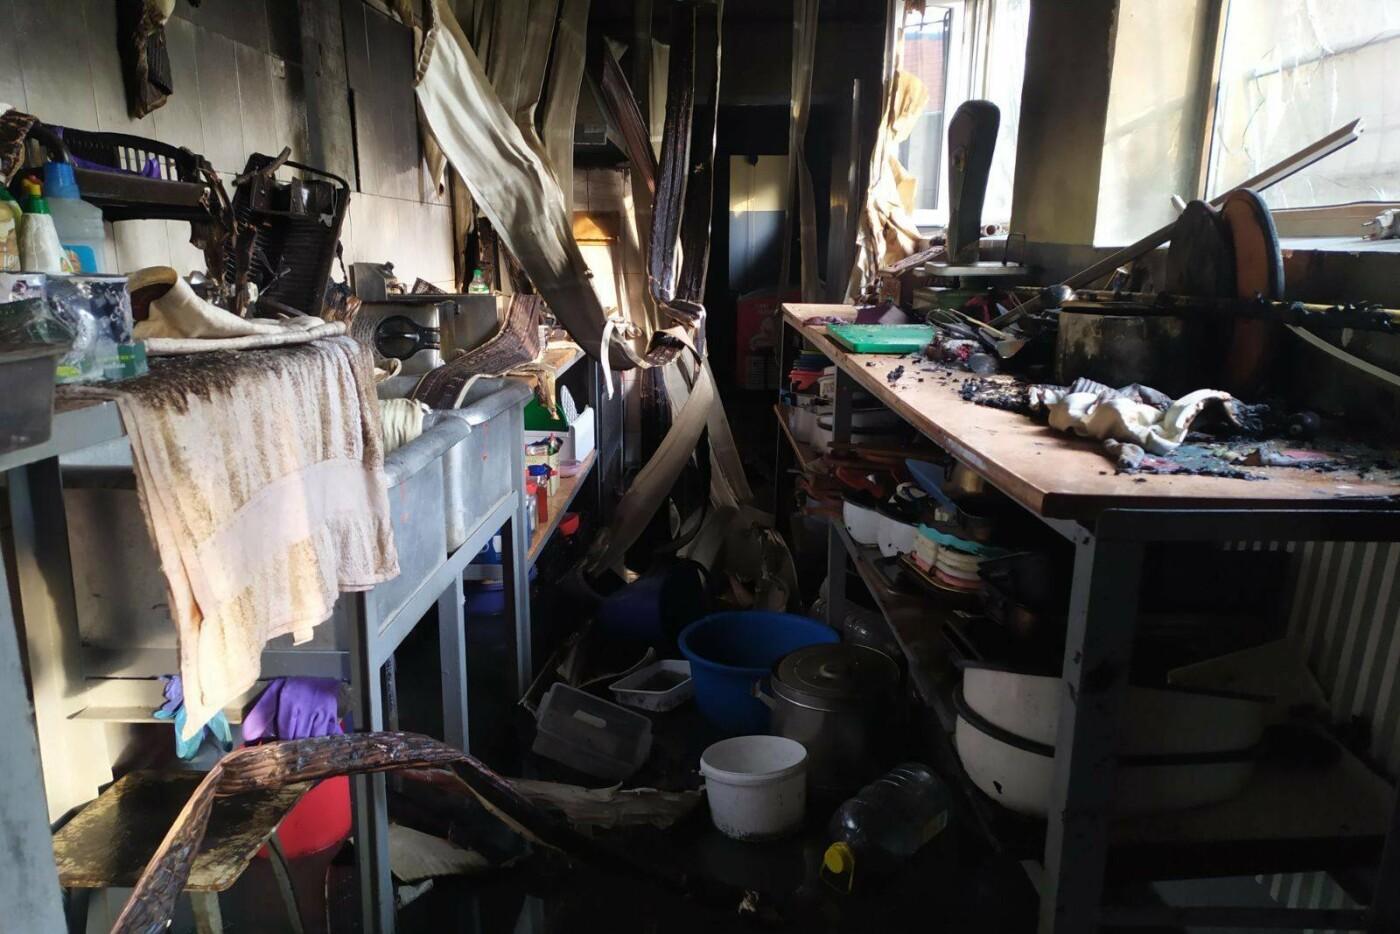 В селе под Харьковом горело кафе. Пострадала одна из сотрудниц, - ФОТО, фото-2